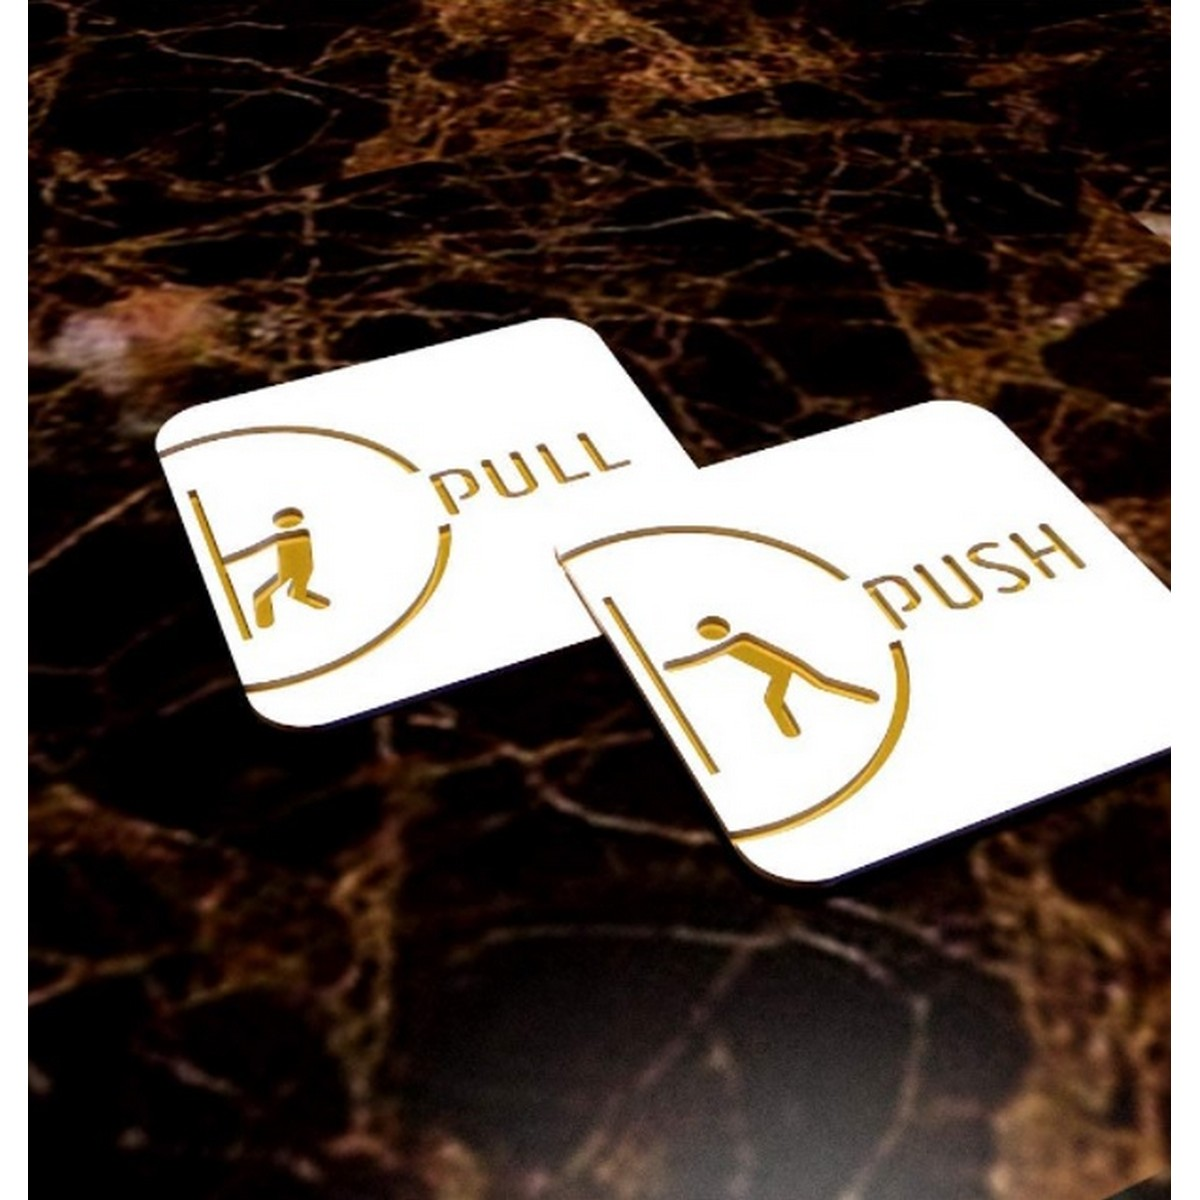 PushPull Acrylic Door Signages  PushPull Acrylic Door Signages 5